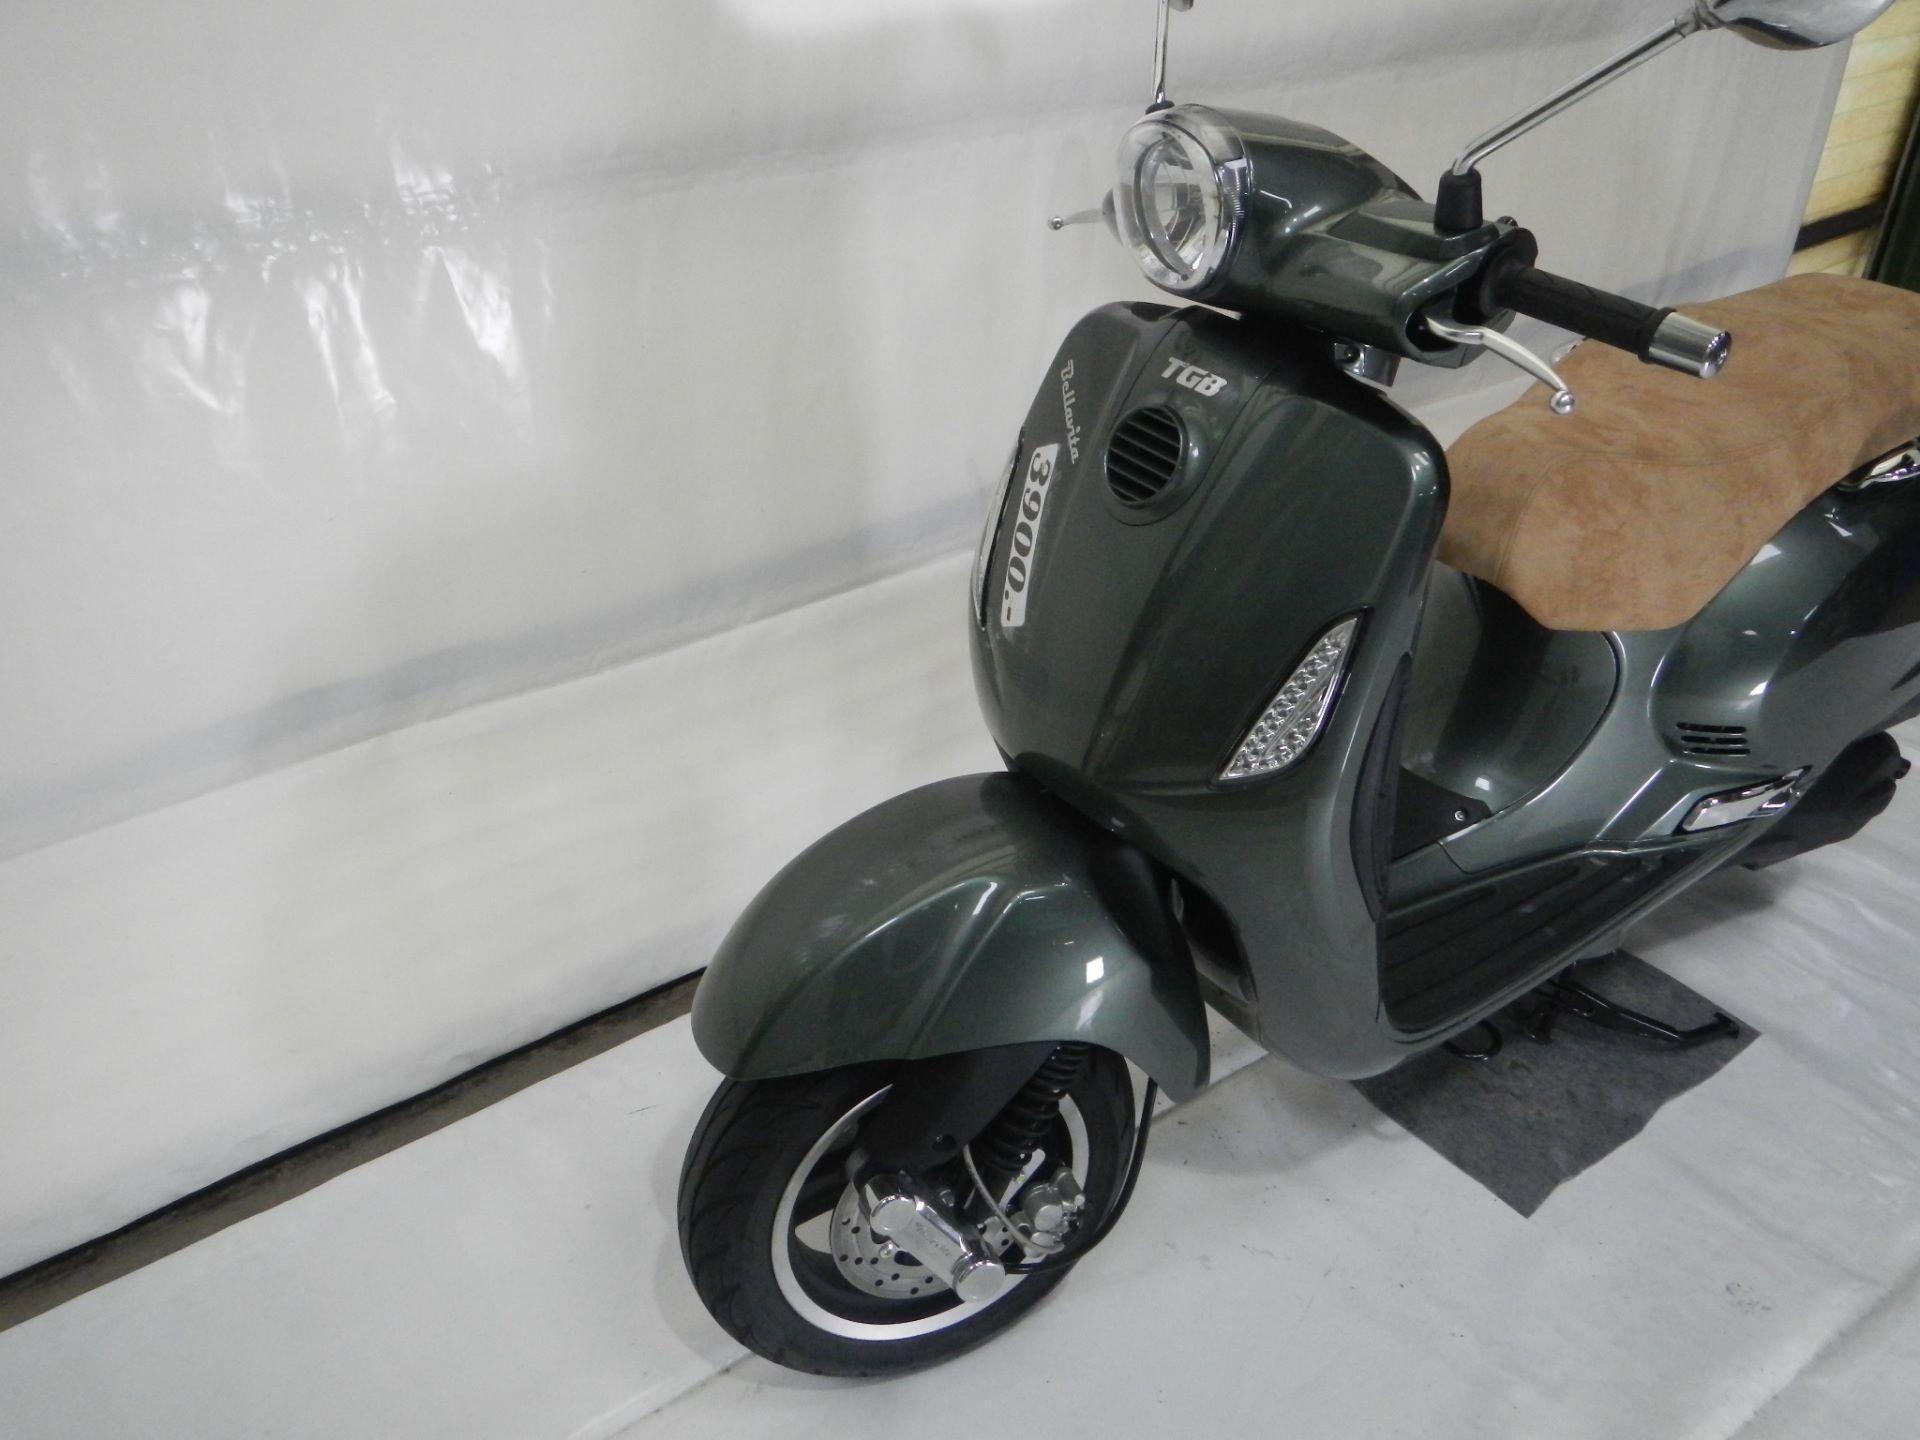 motorrad occasion kaufen tgb bellavita 125 gaberth l moto. Black Bedroom Furniture Sets. Home Design Ideas